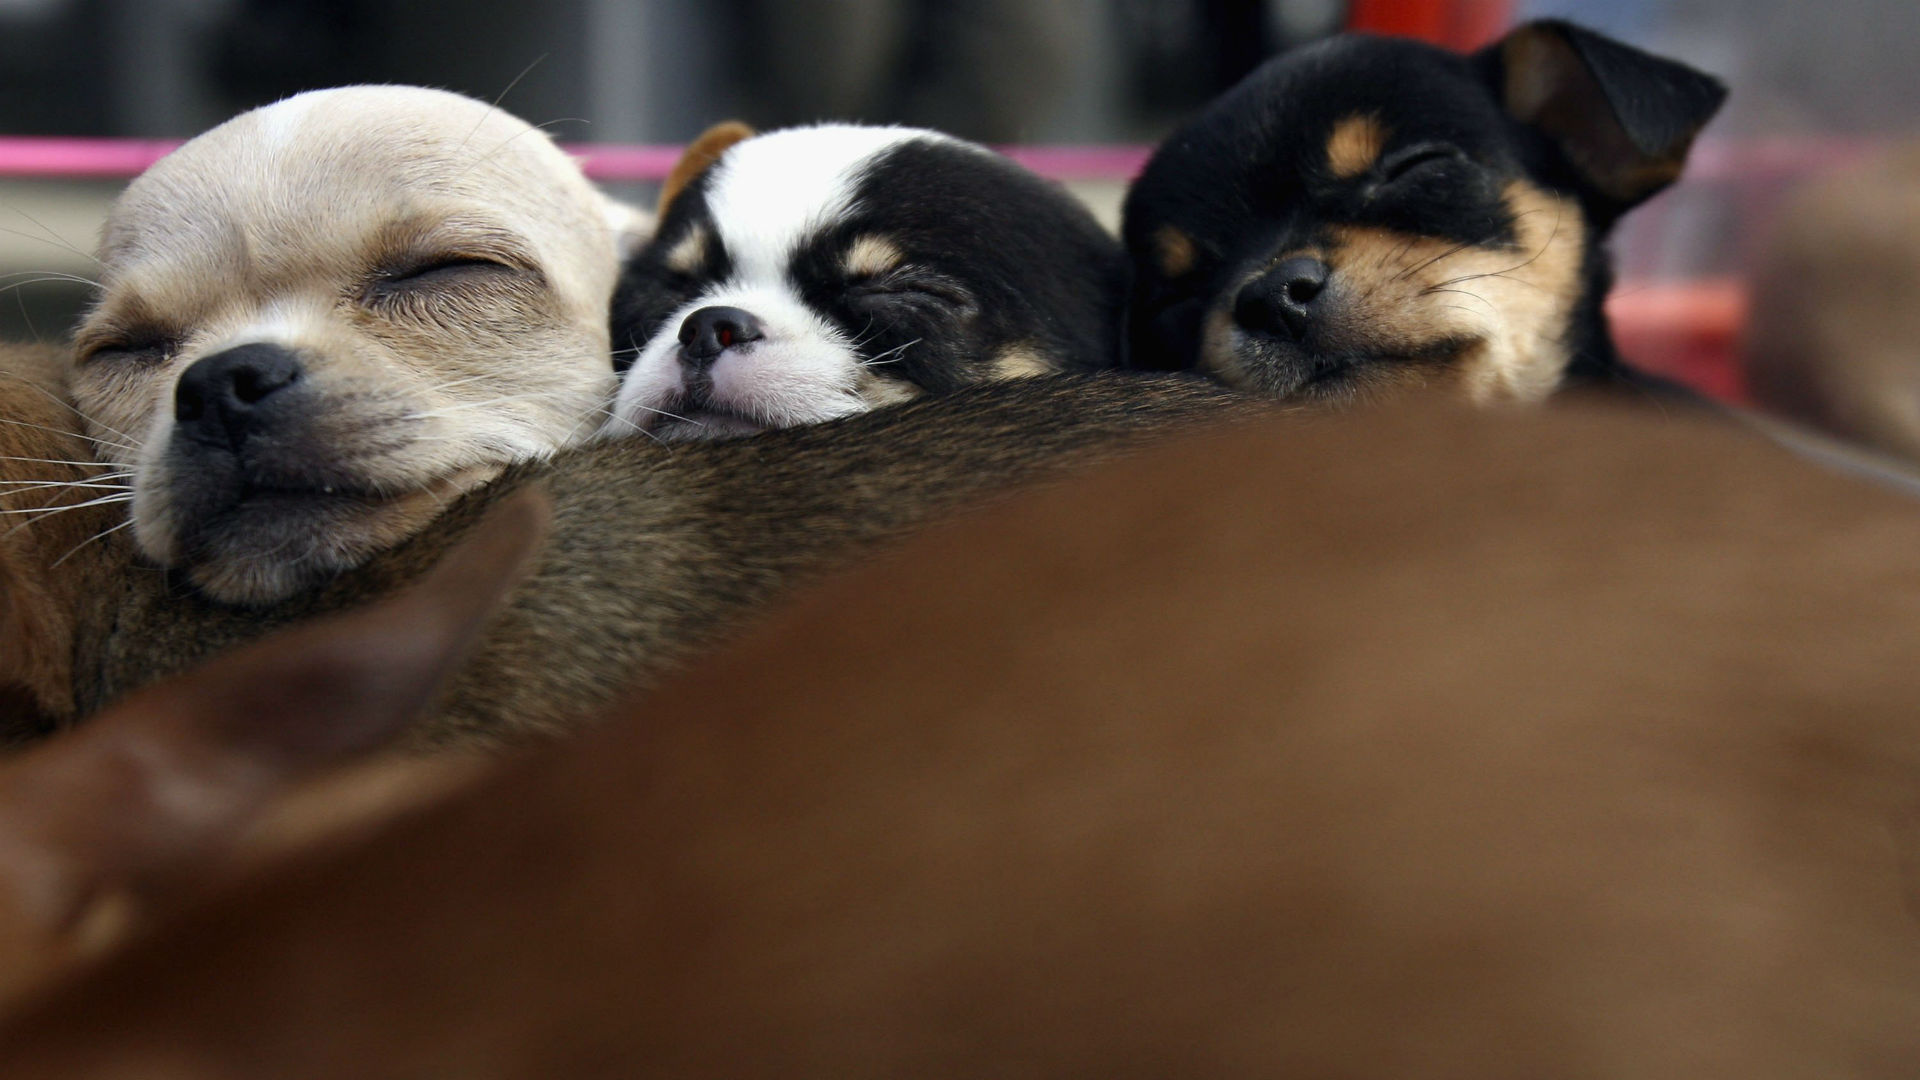 puppies-22916-usnews-getty-FTR